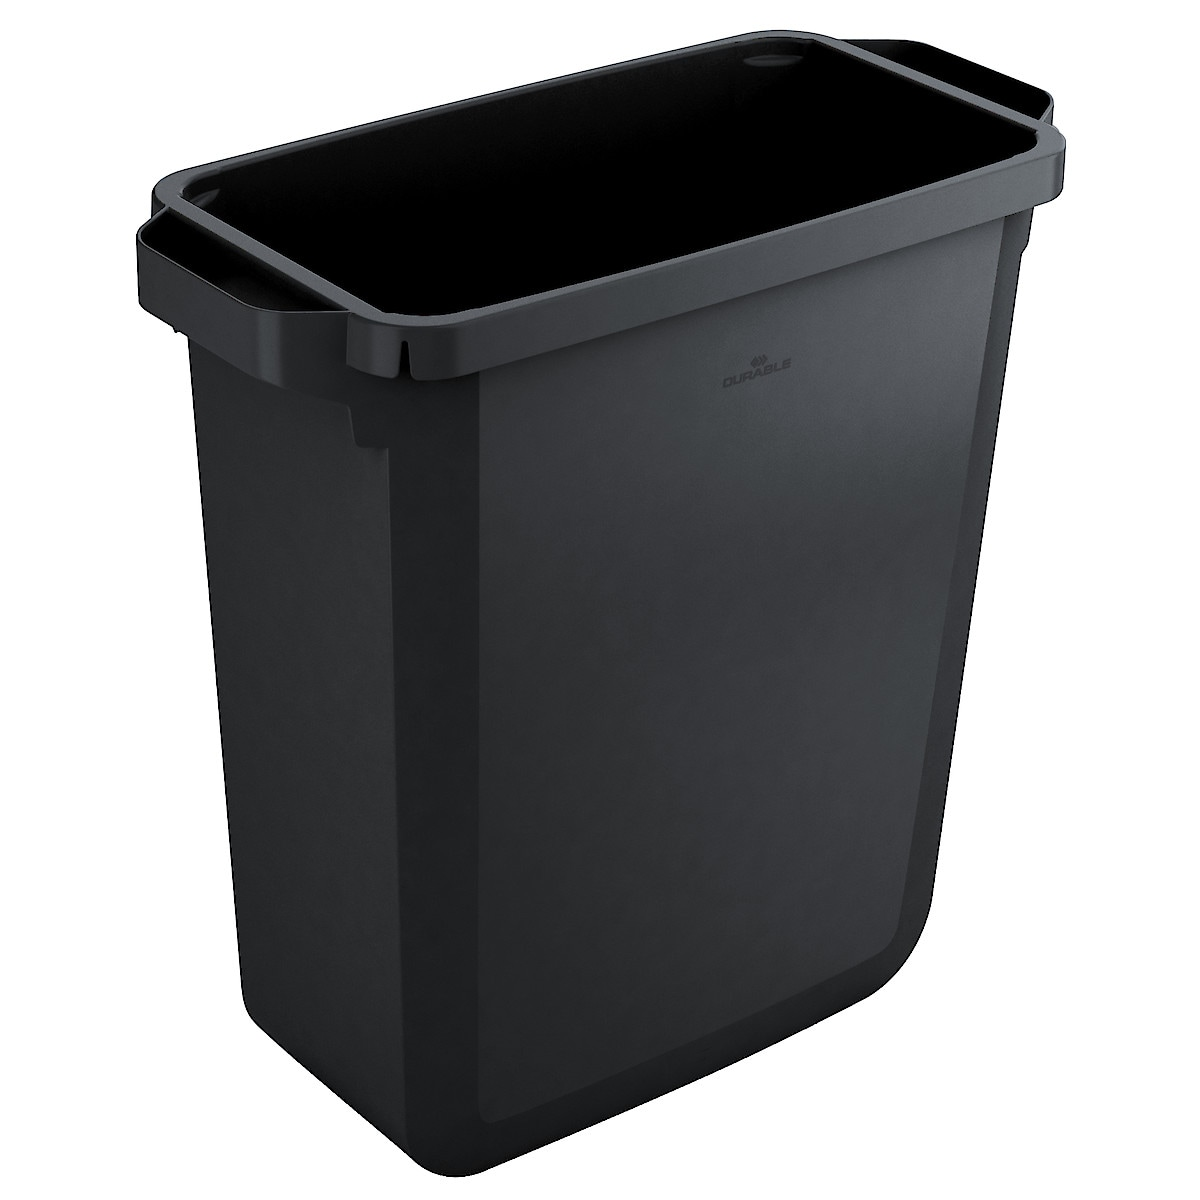 Durabin 60 l søppeldunk, svart